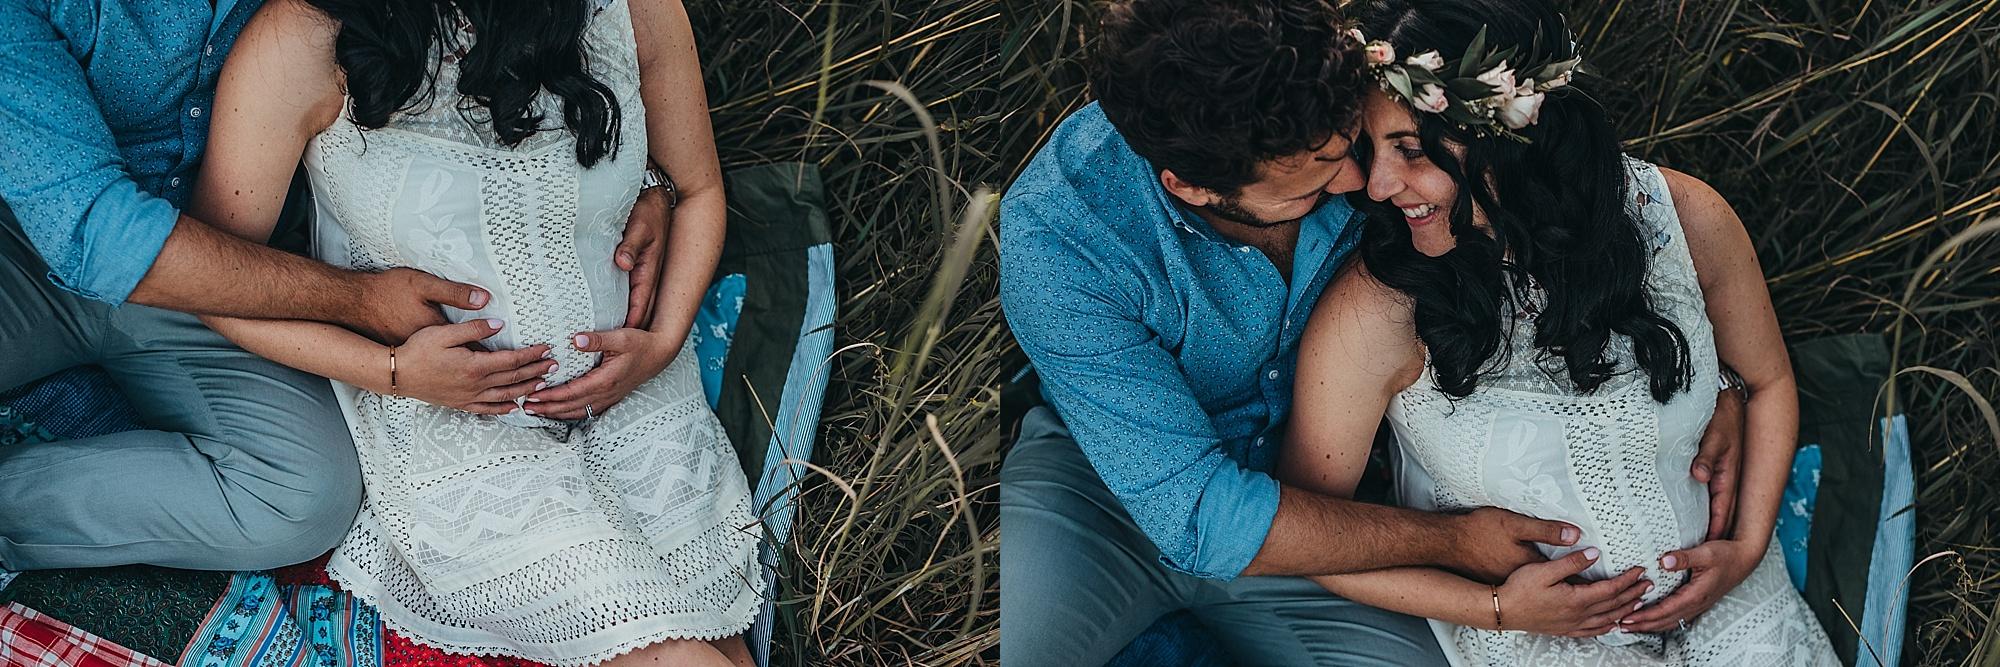 lauren-grayson-photography-cleveland-ohio-photographer-maternity-summer-outdoor-bohemian-fields-session_0473.jpg